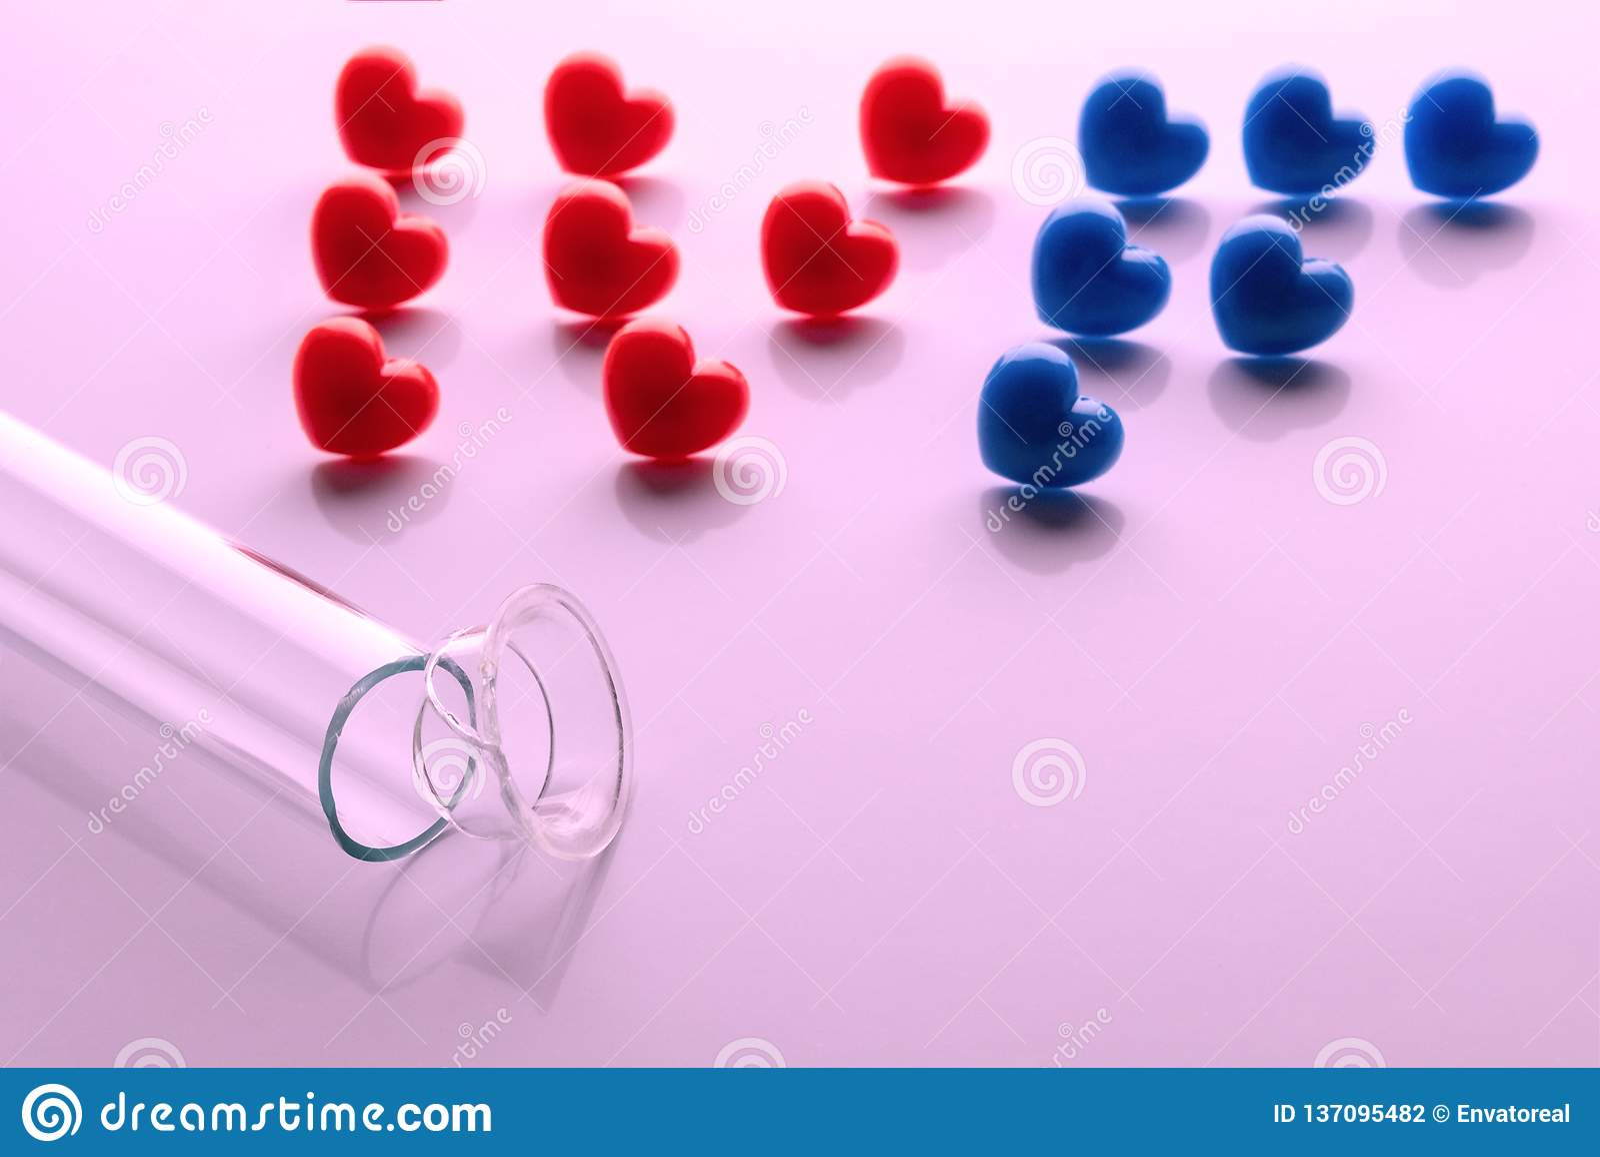 ivf dating cerbung icil matchmaking del 25